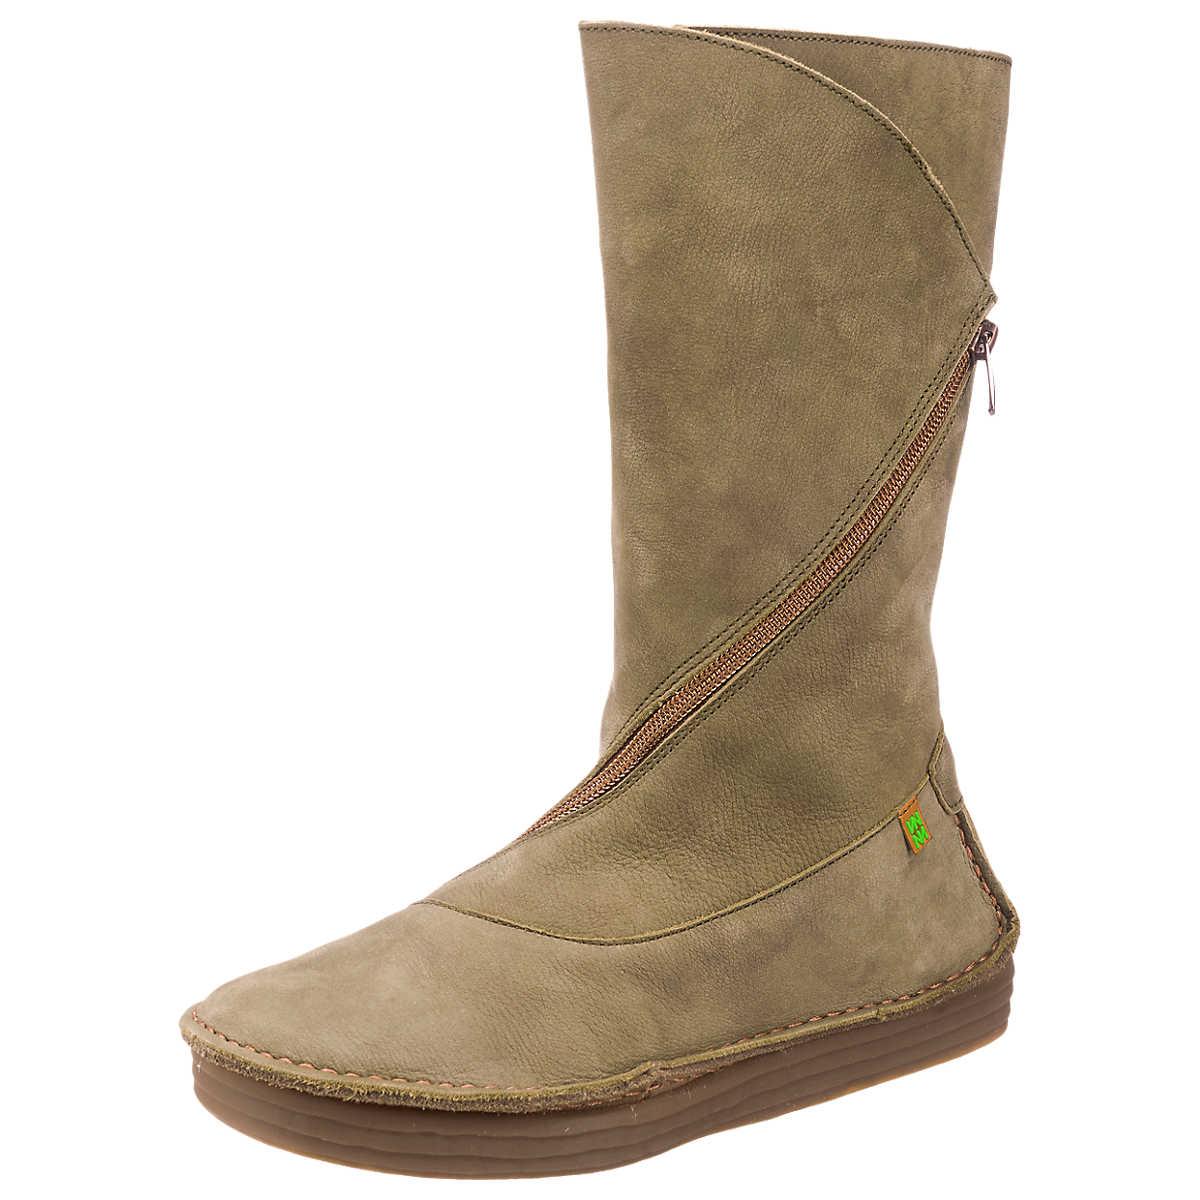 EL NATURALISTA Ricefield Stiefel khaki - EL NATURALISTA - Stiefel - Schuhe - mirapodo.de